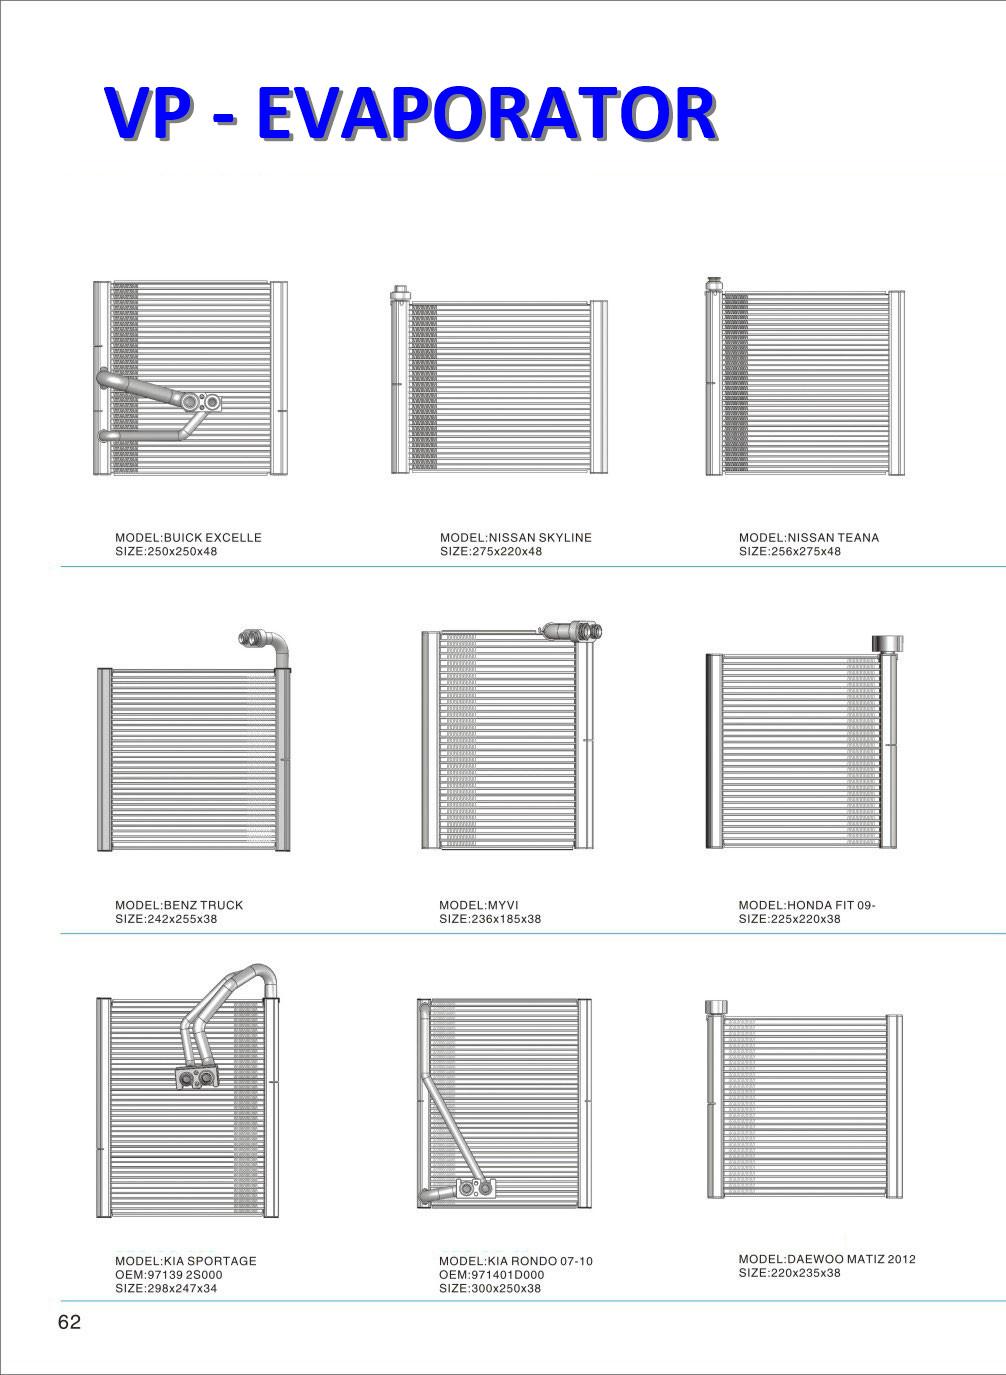 Evaporator for different models of car Toyota,Honda,Mitsubishi